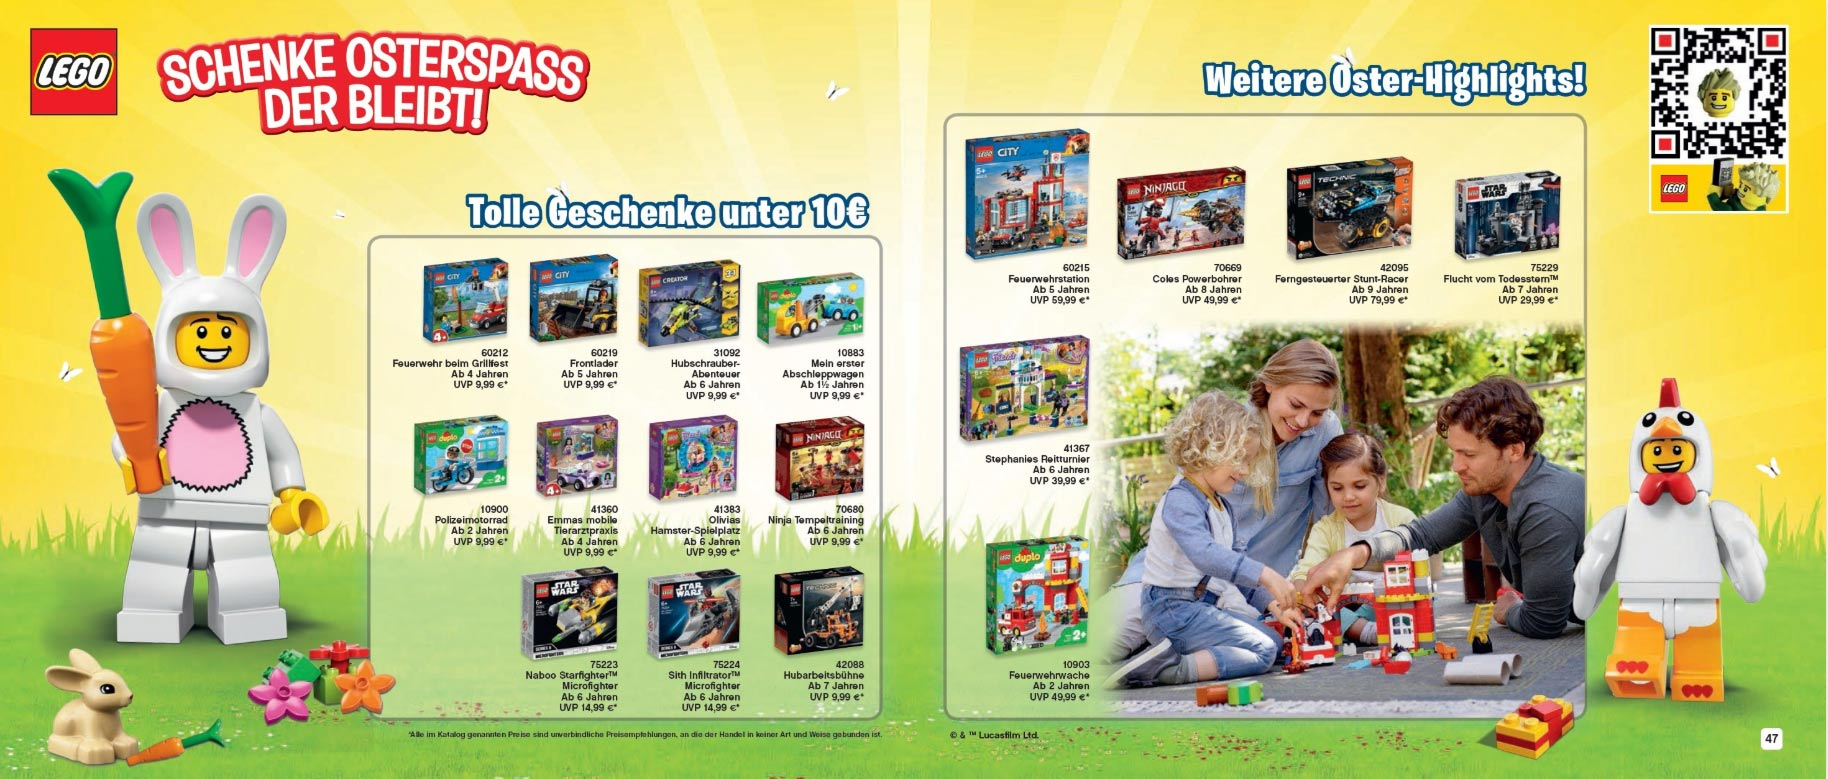 lego-katalog-2019-januar-bis-juni-ostern zusammengebaut.com